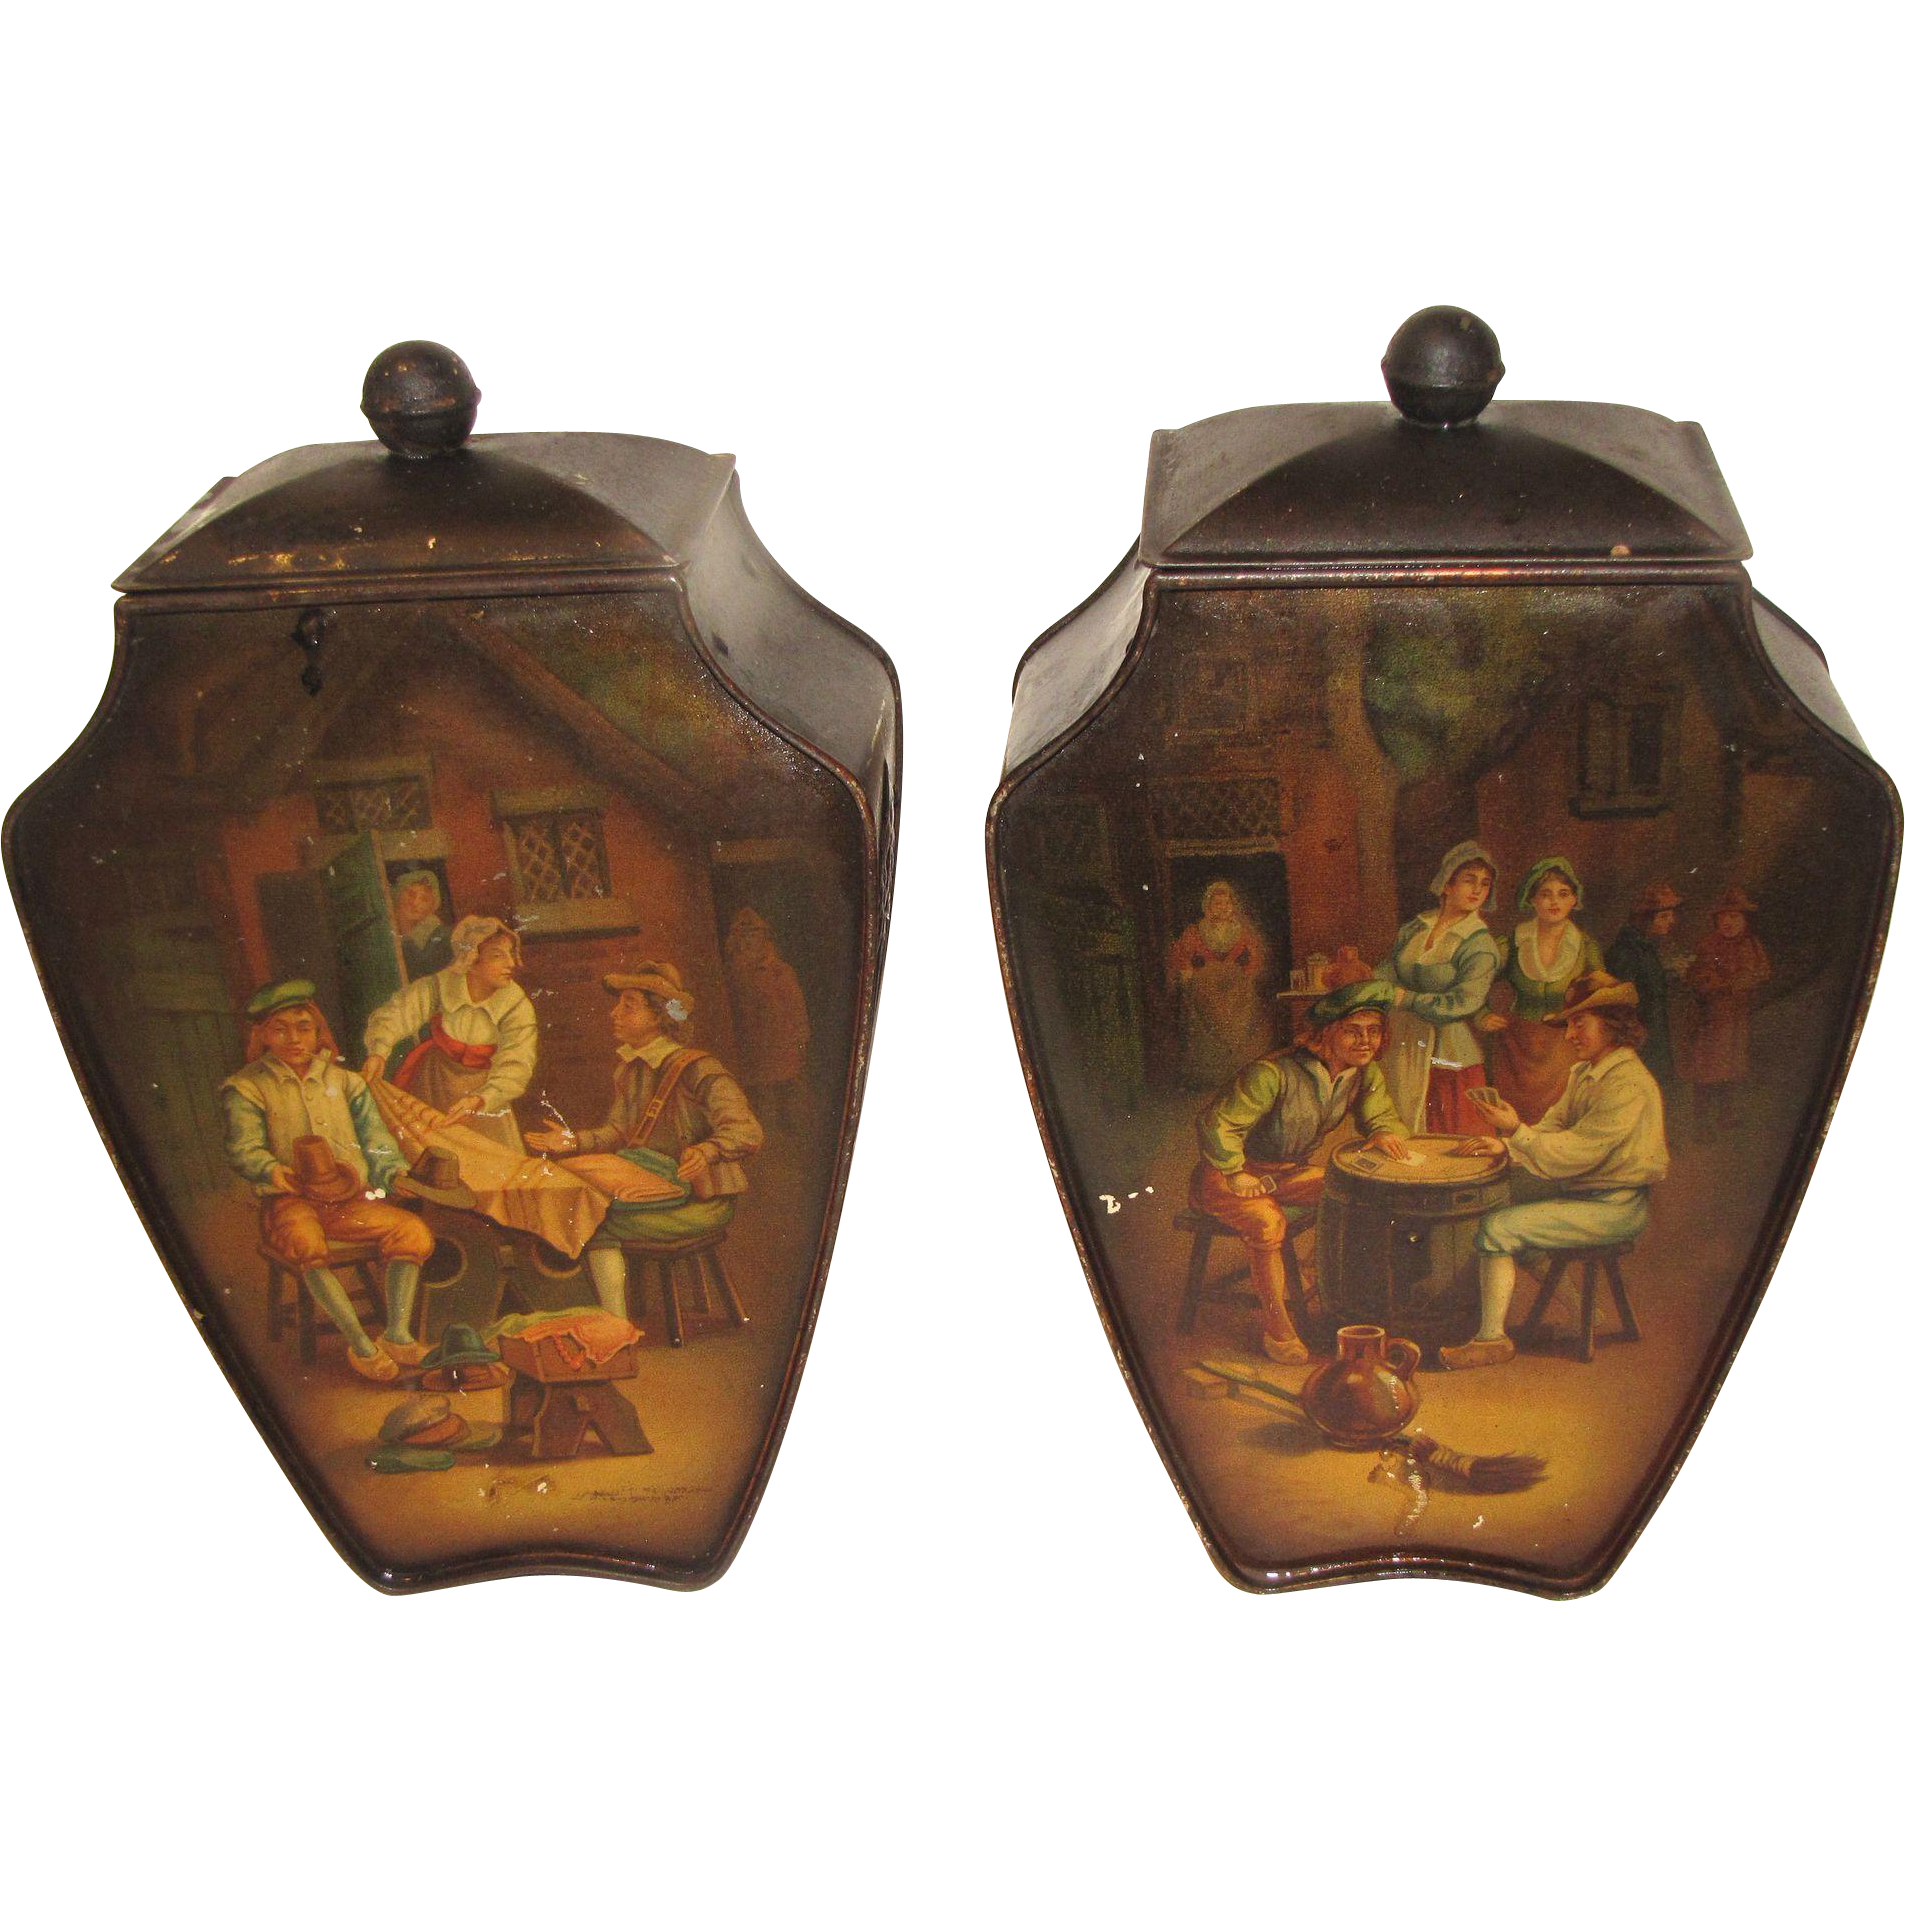 CA 1909-12 British Biscuit Tin, FLEMISH VASE, Huntley & Palmers